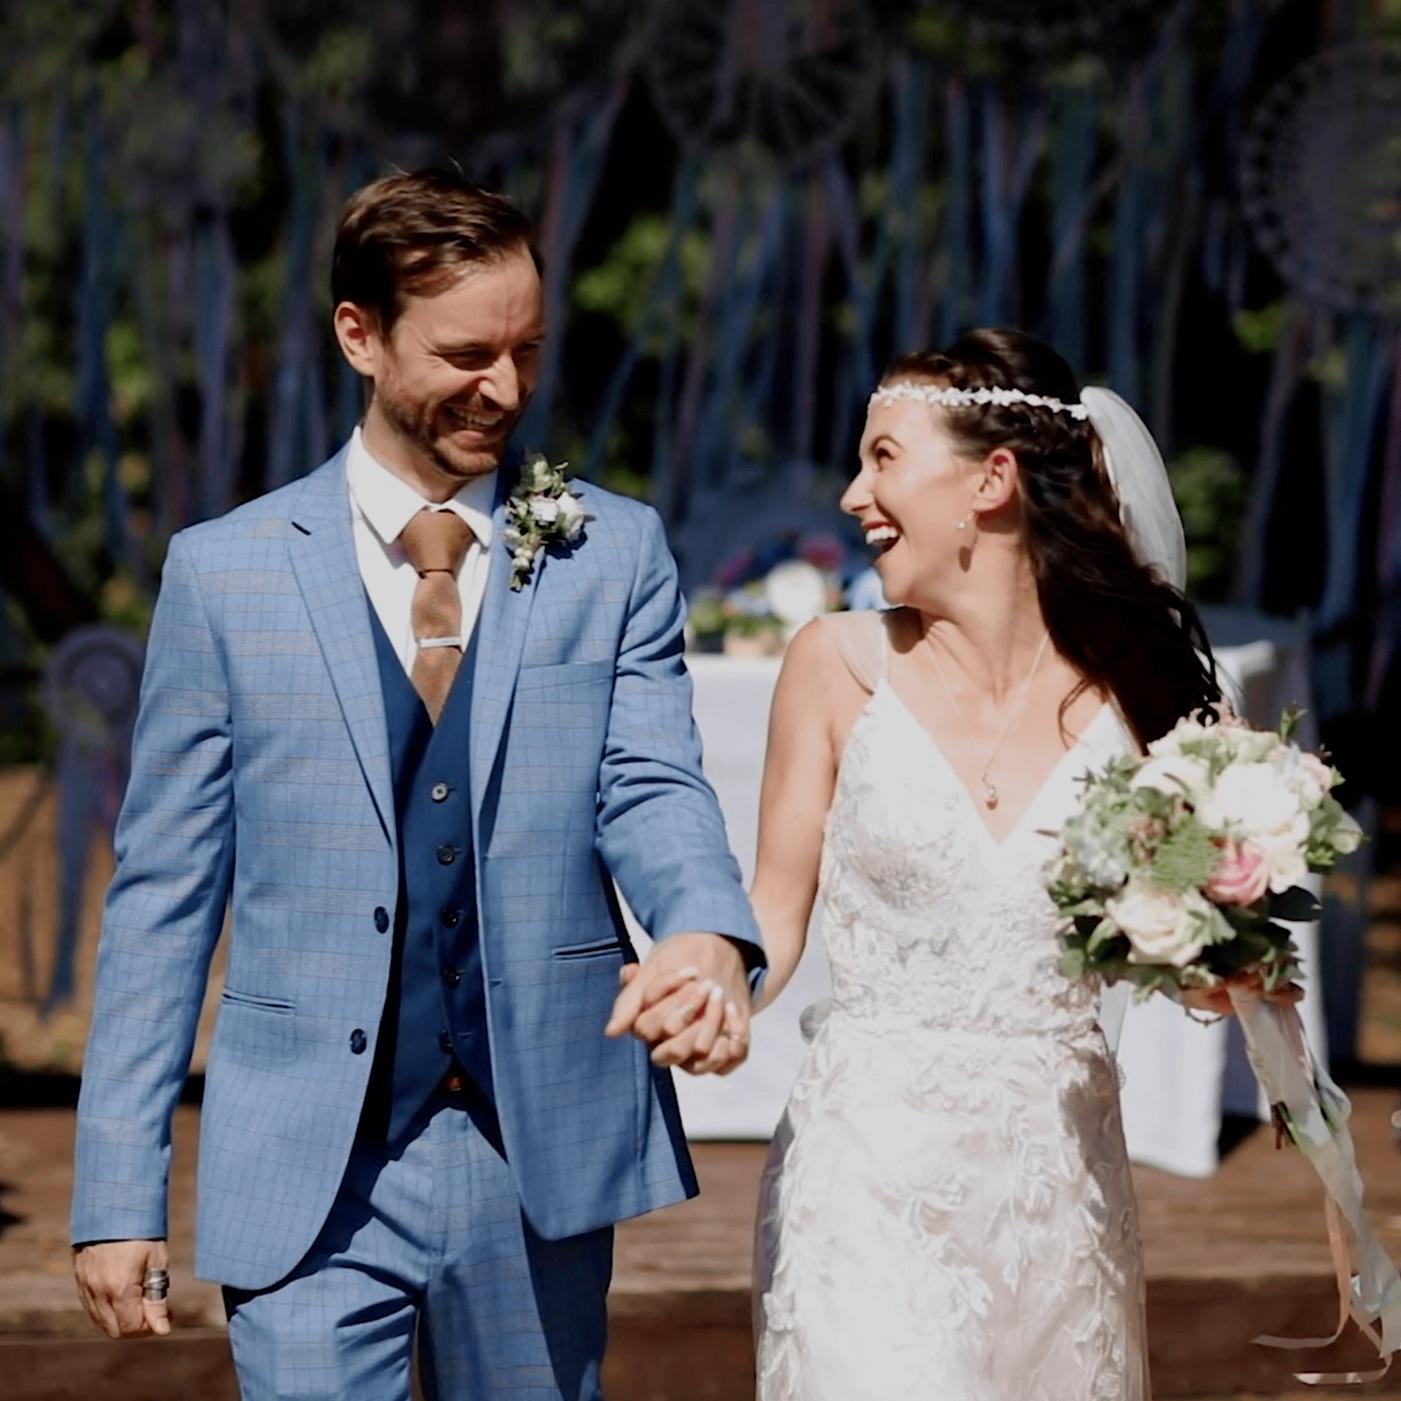 Keeley wedding films - wedding video bedfordshire